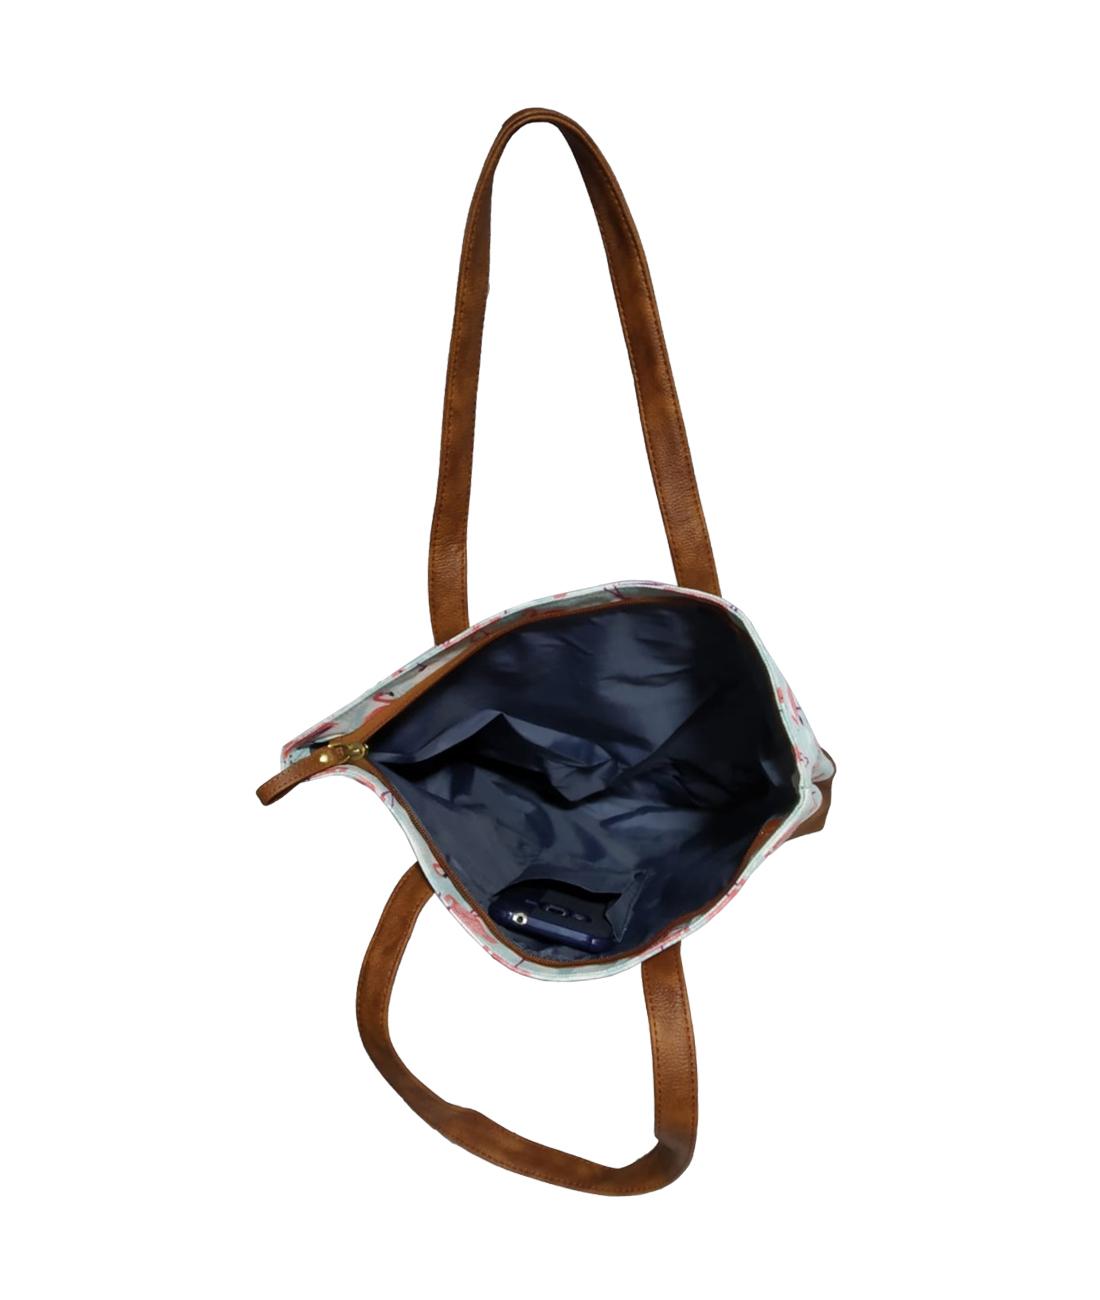 Caris Printed Shopping Bag